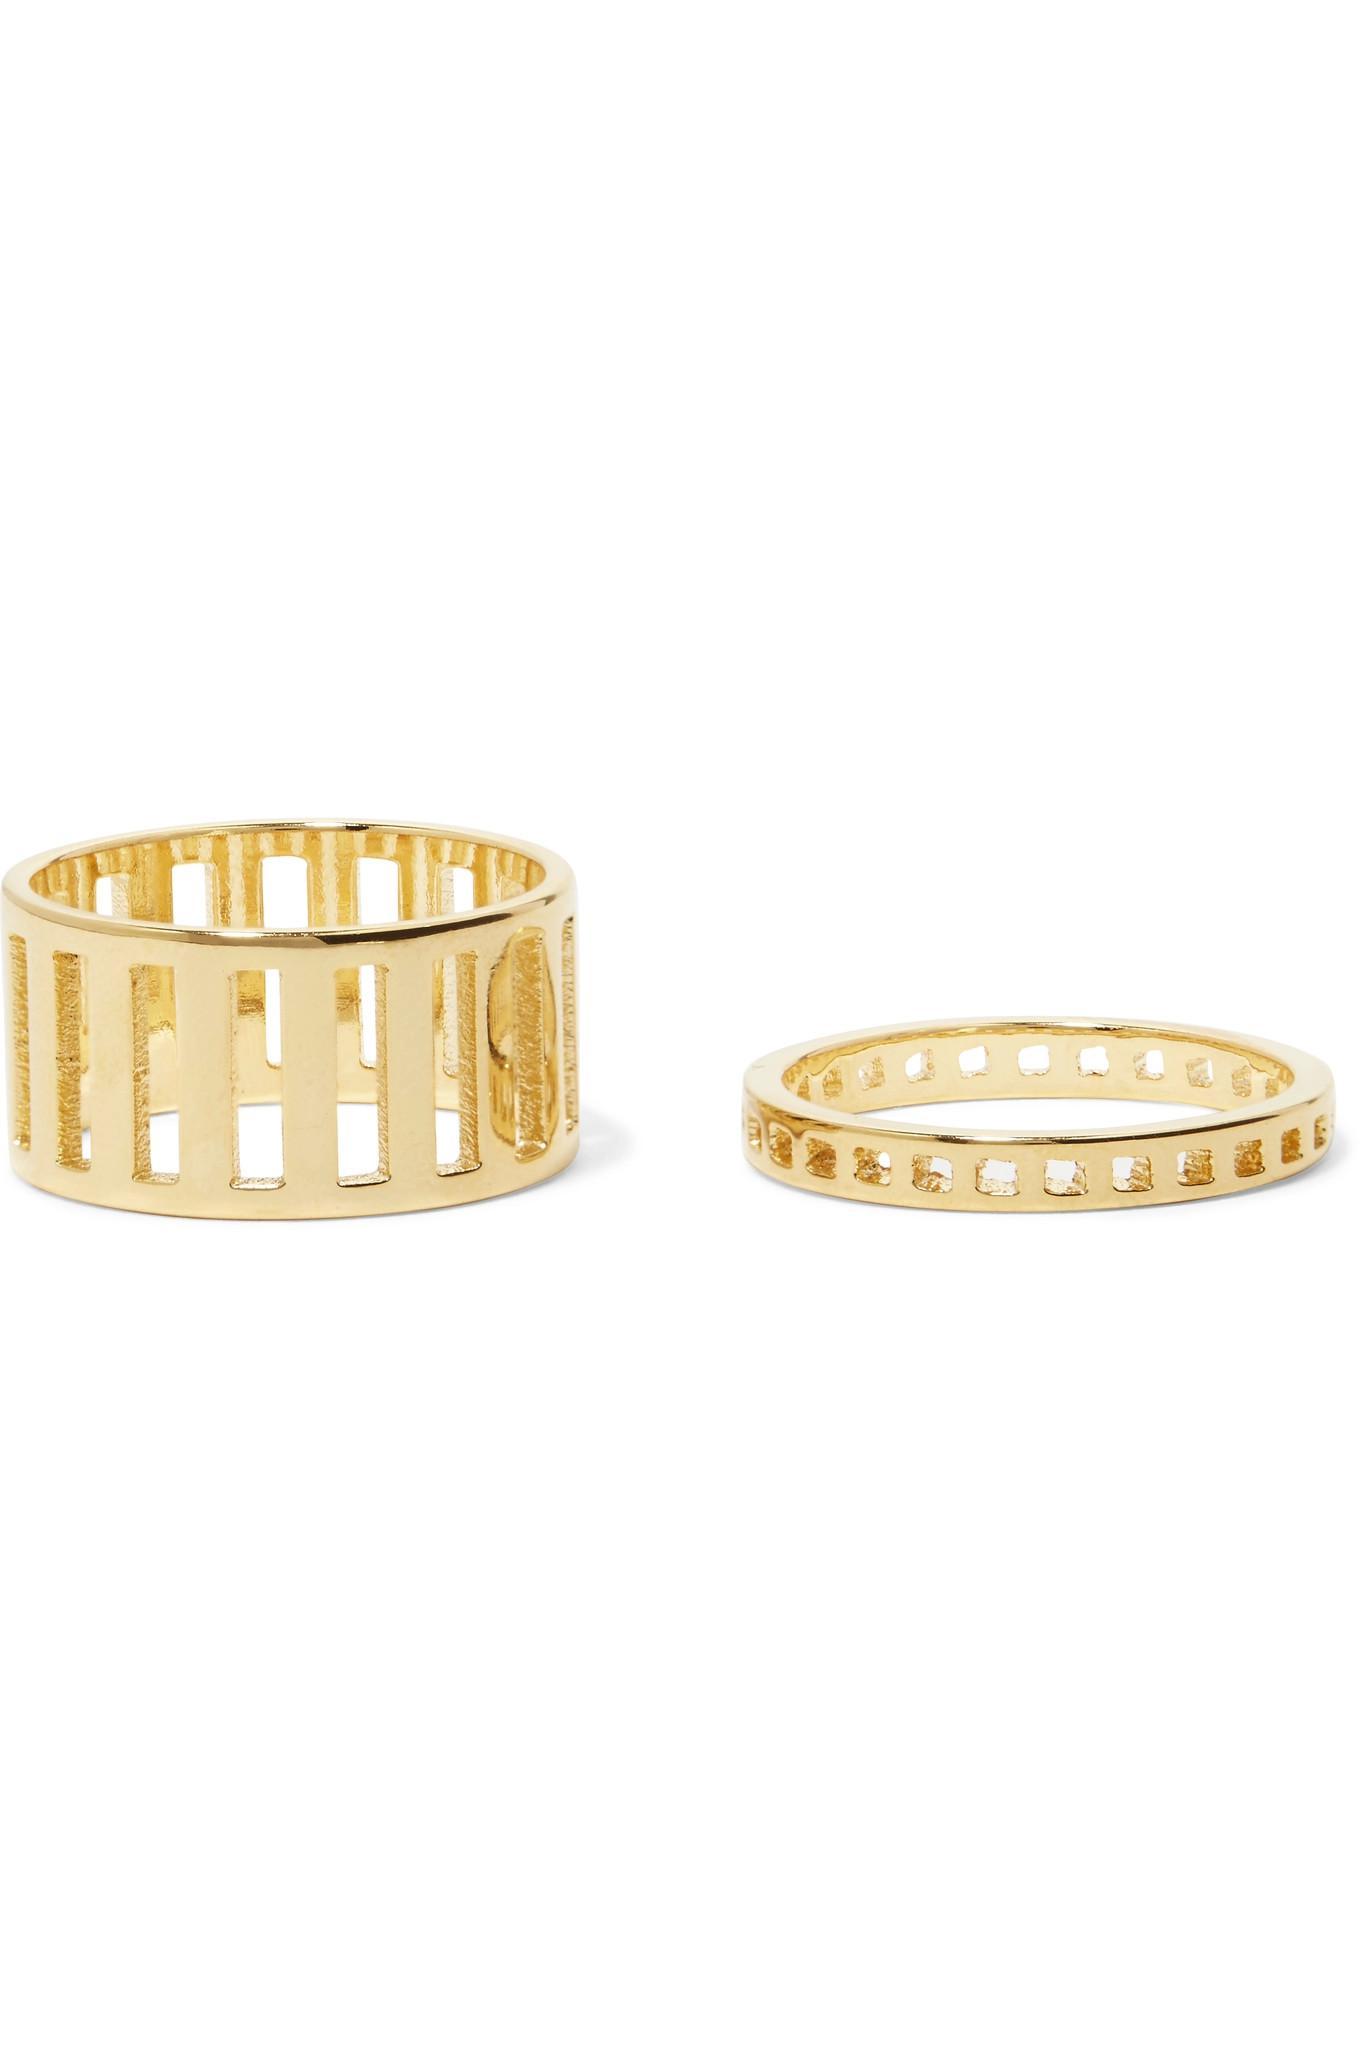 Arme De Lamour Woman Set Of Two Rose Gold-tone Rings Silver Size 6 Arme De L'Amour hKKfk4I1